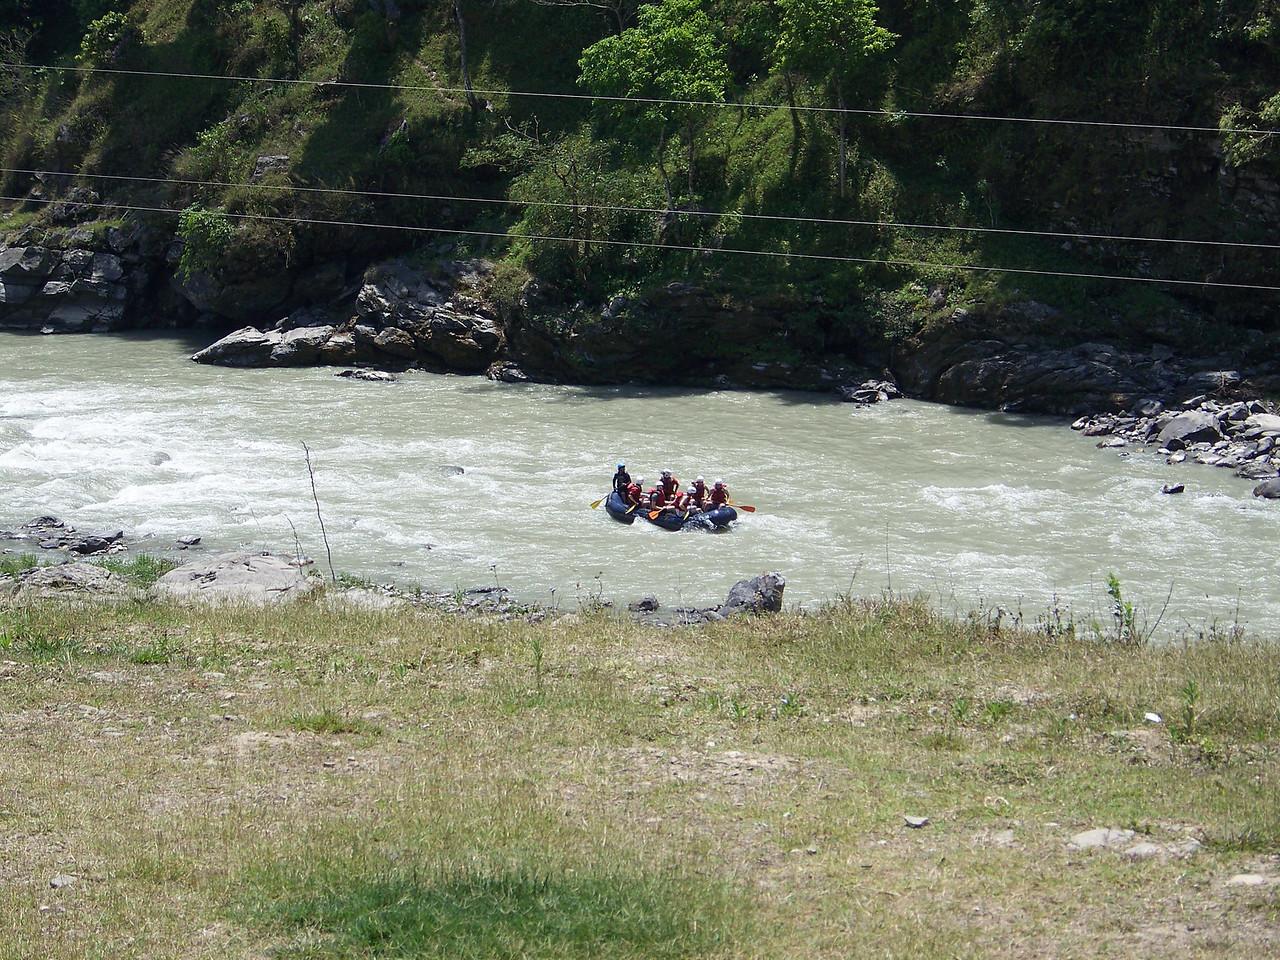 0657 - Rafters on the Bhote Koshi River next to the River View Restaurant - Andheri Shidhupalchowk Nepal.JPG